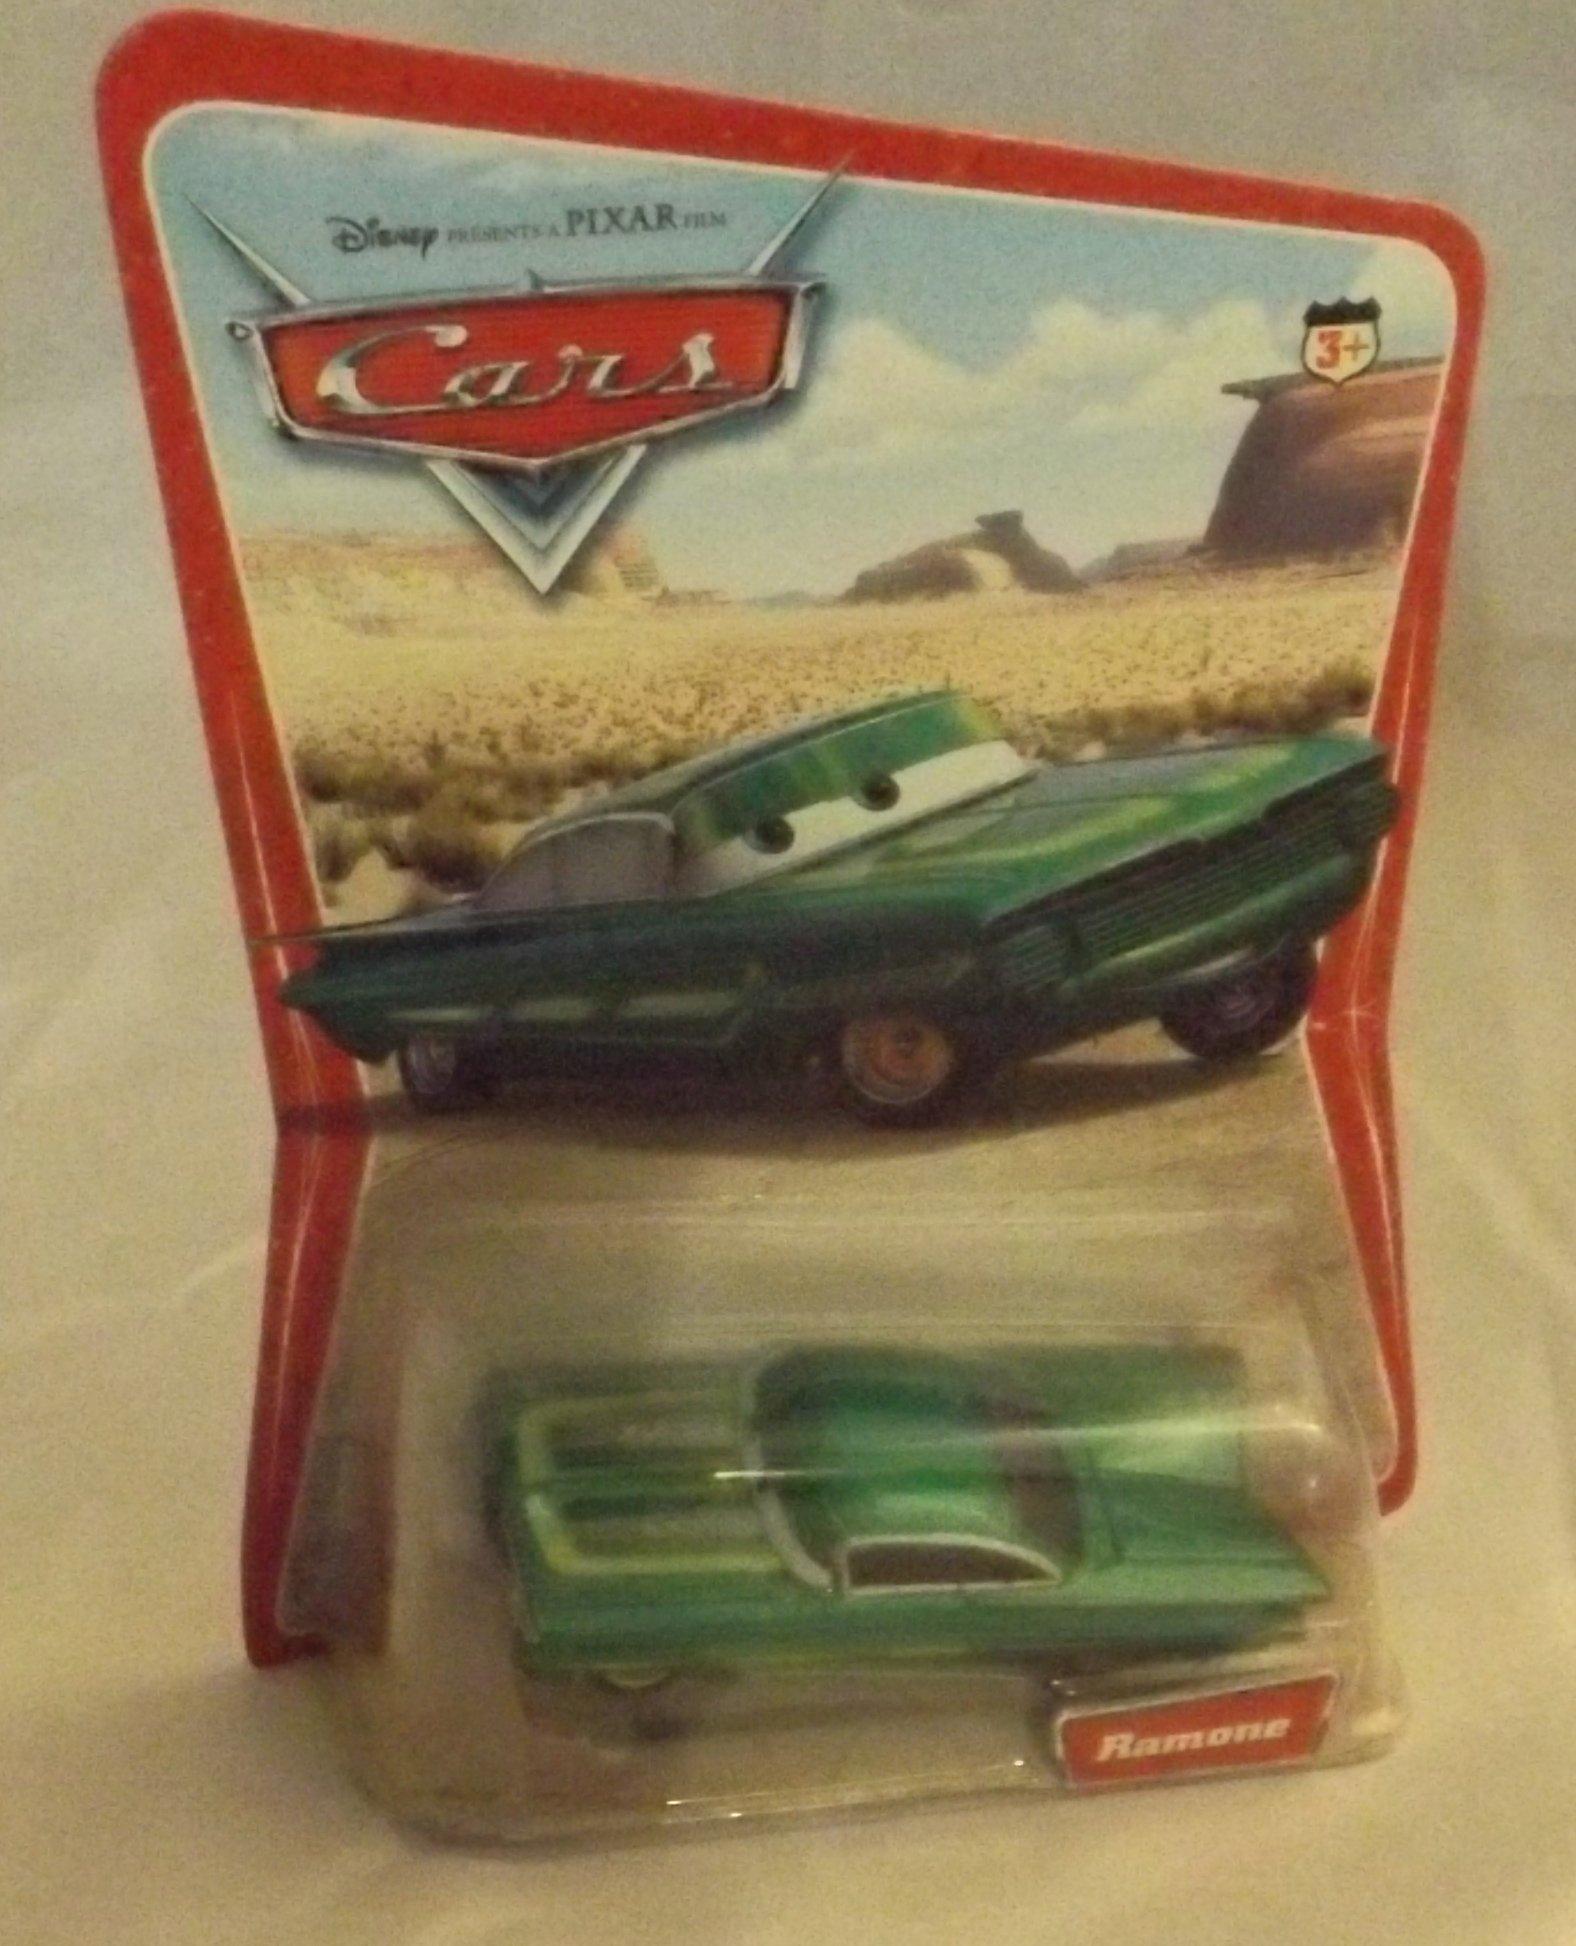 Disney Pixar Cars Series 1 Original Green Ramone 1:55 Scale Die Cast Car